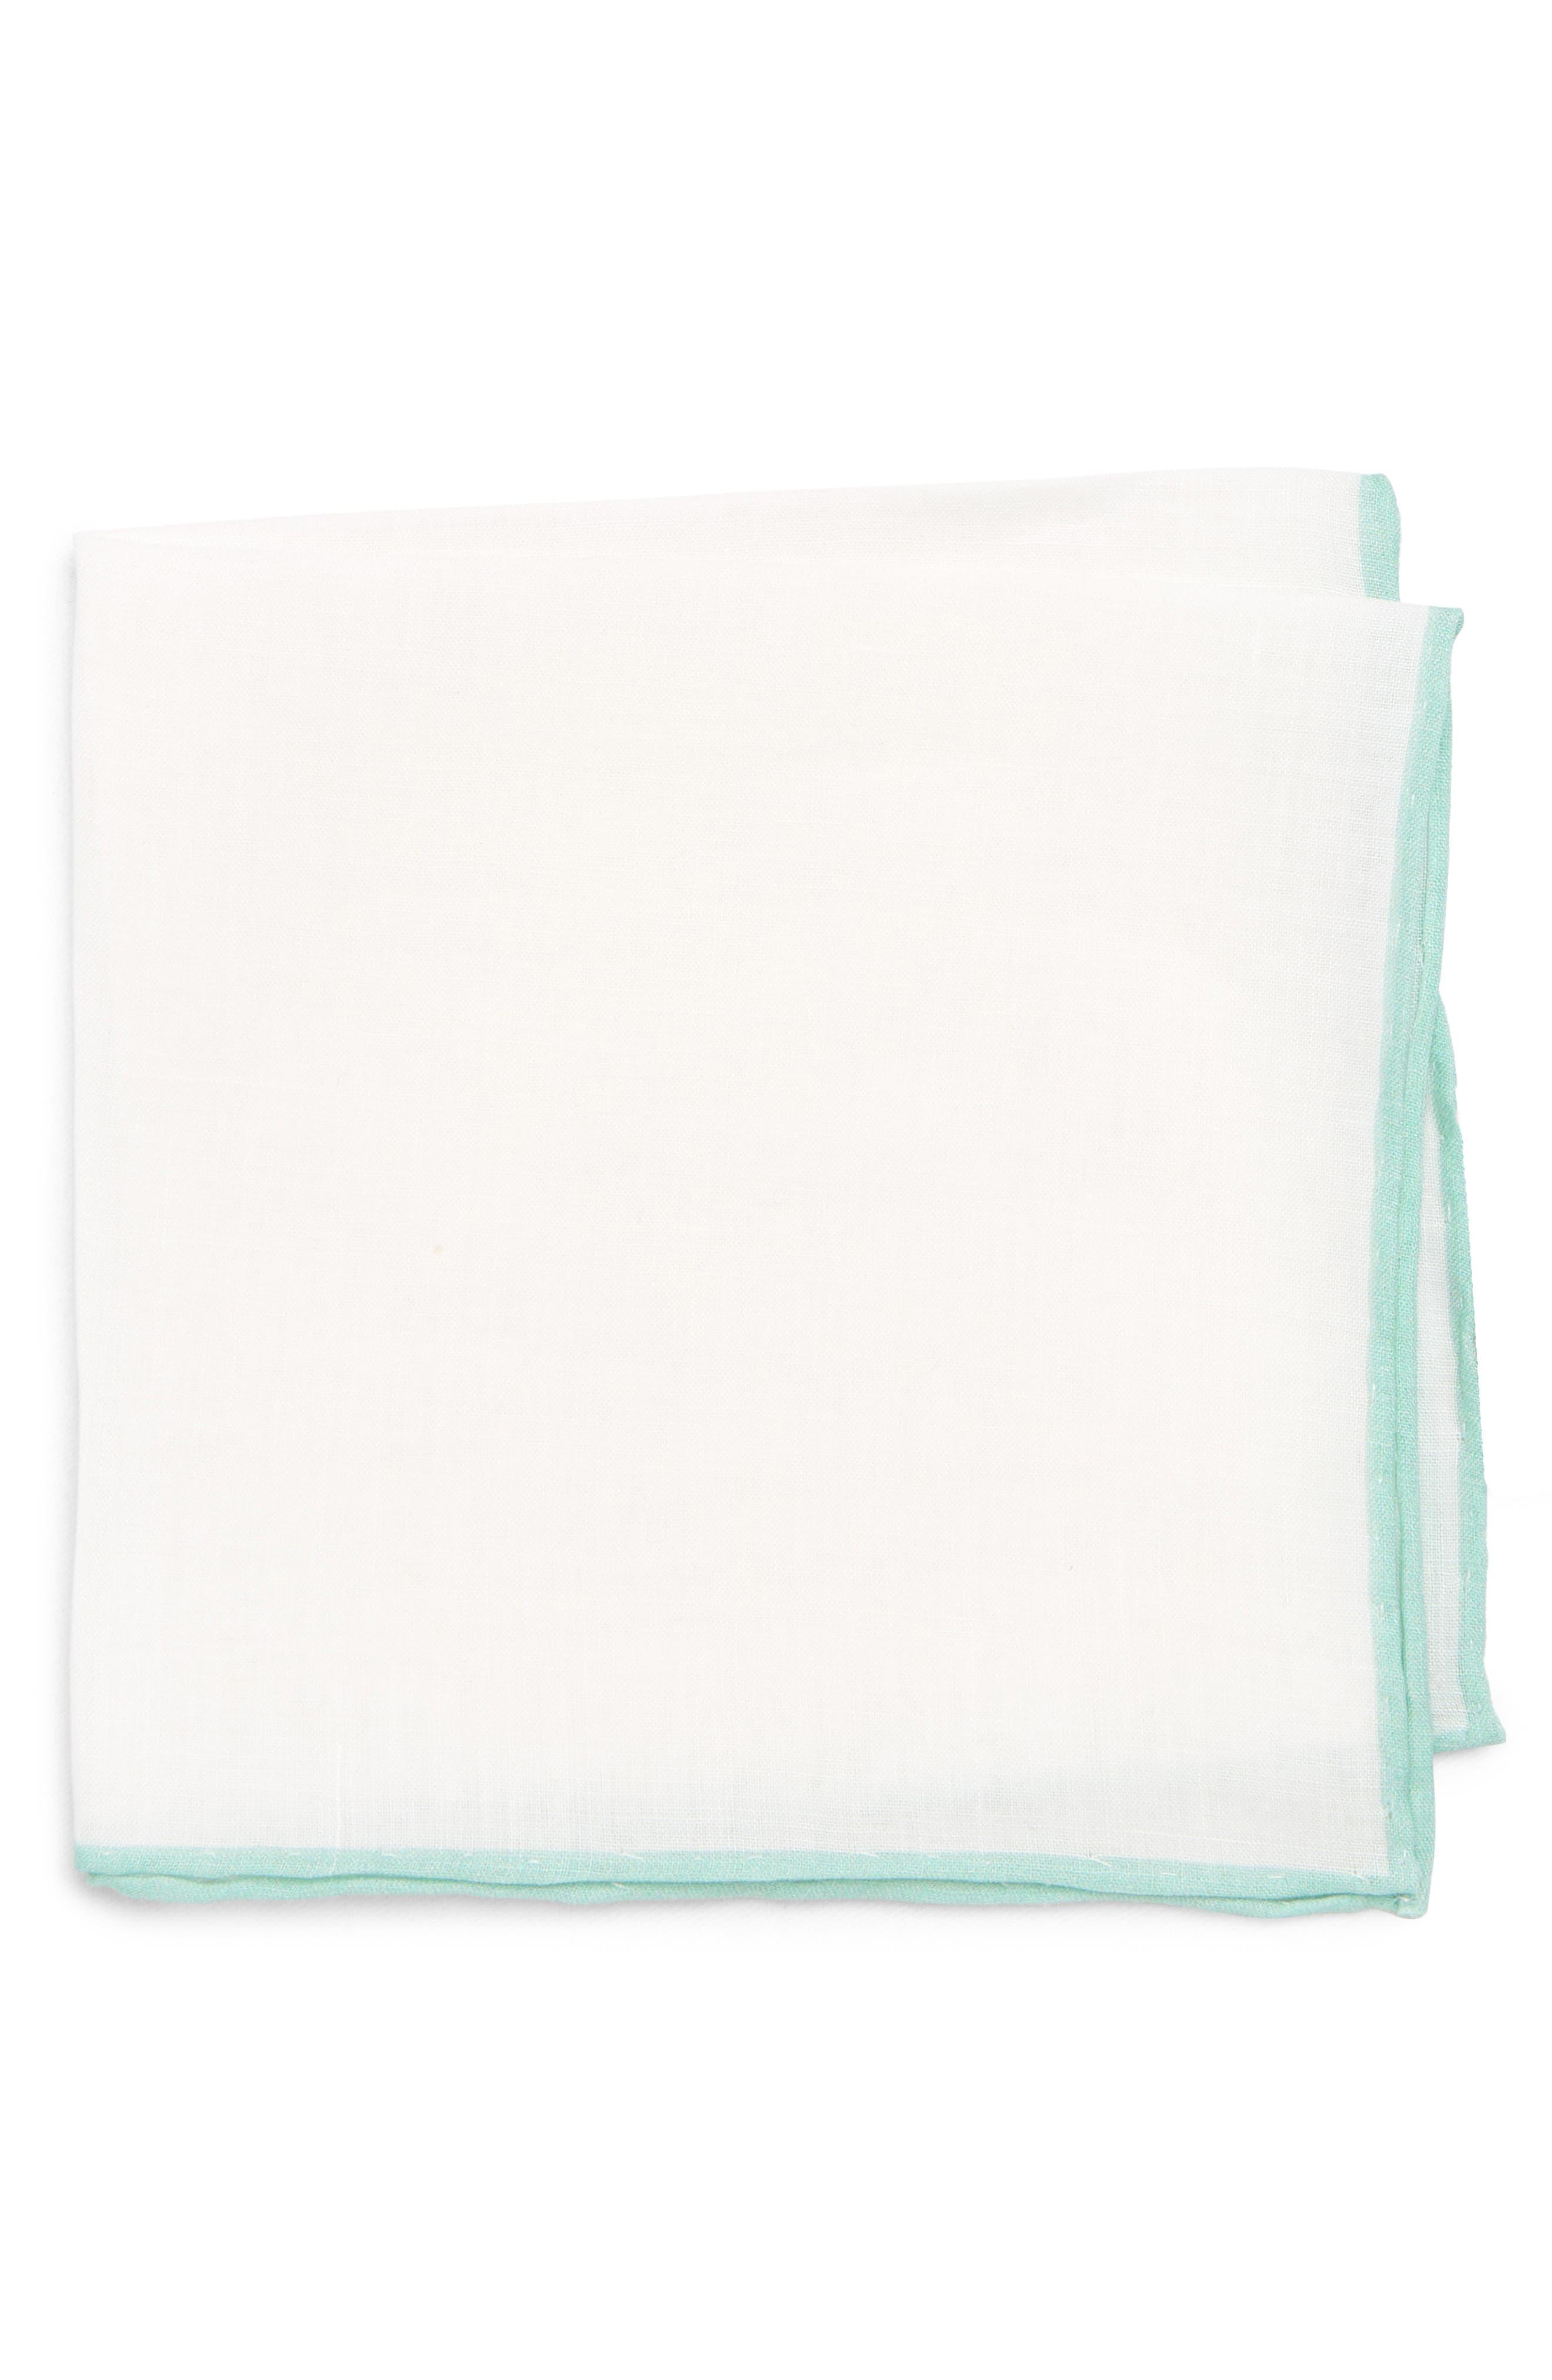 Linen Pocket Square,                             Main thumbnail 1, color,                             White/ Spearmint